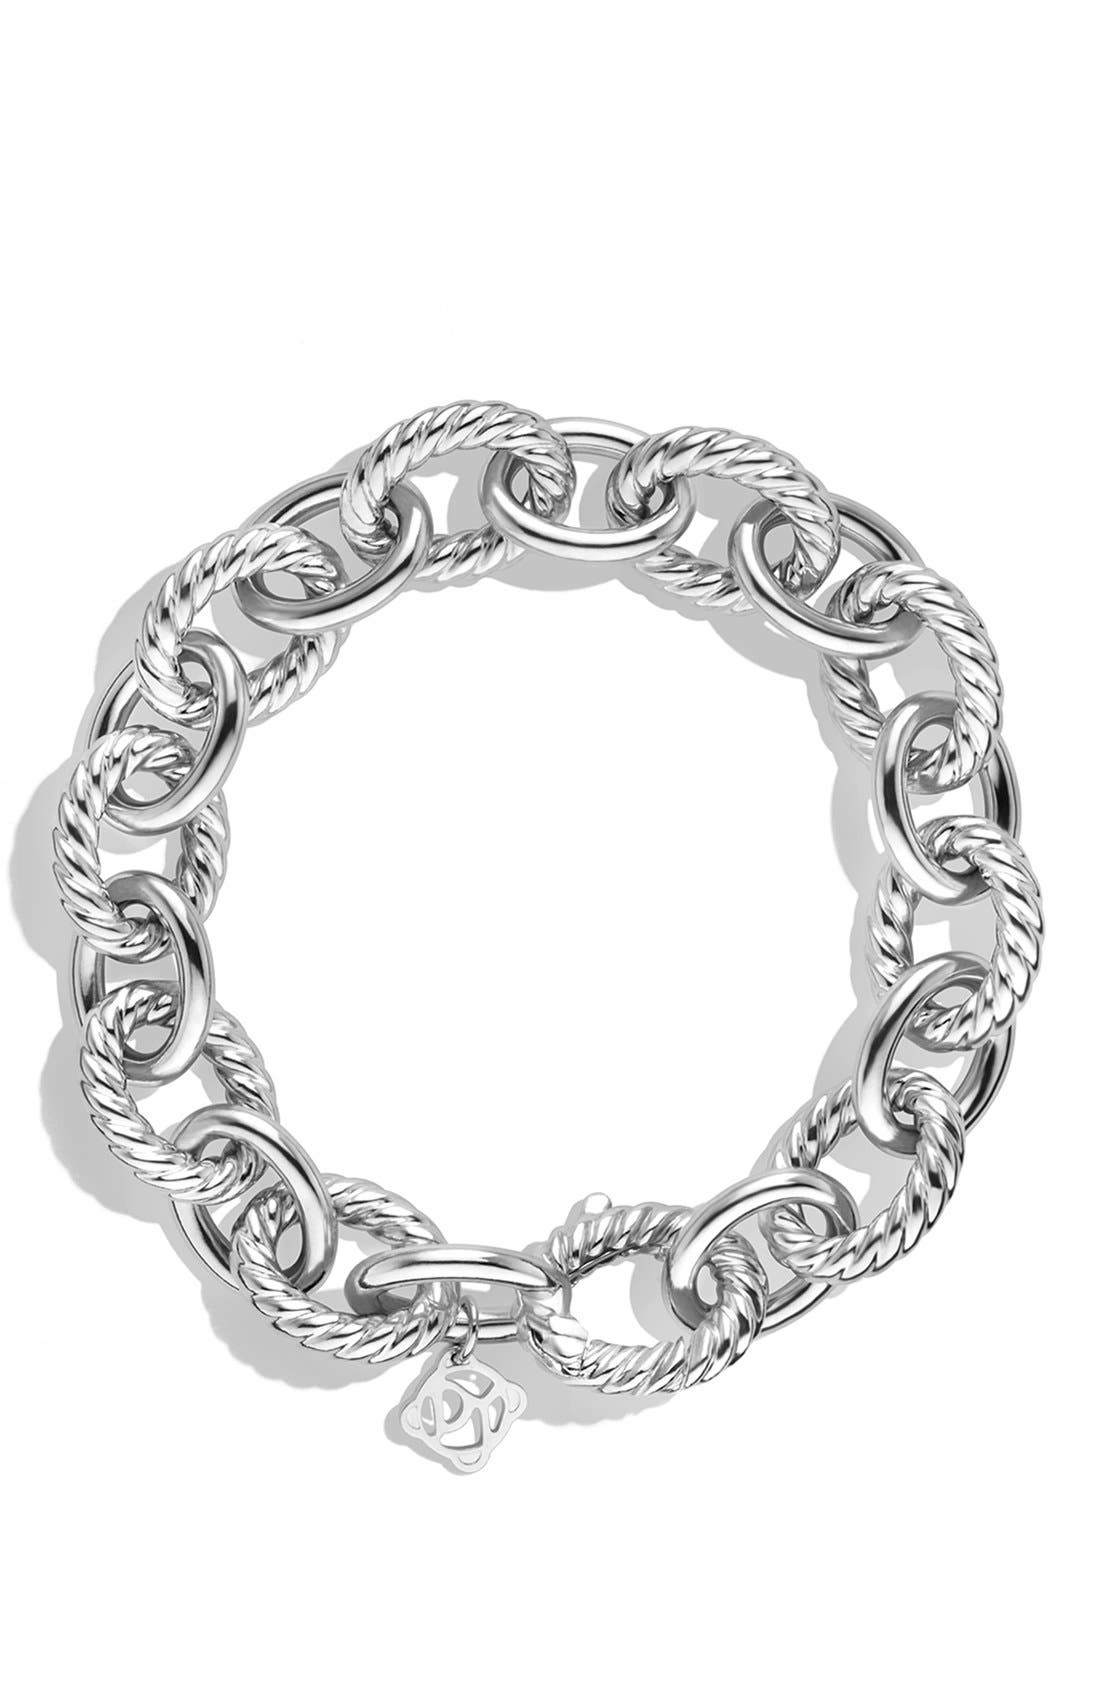 DAVID YURMAN, 'Oval' Large Link Bracelet, Alternate thumbnail 3, color, SILVER